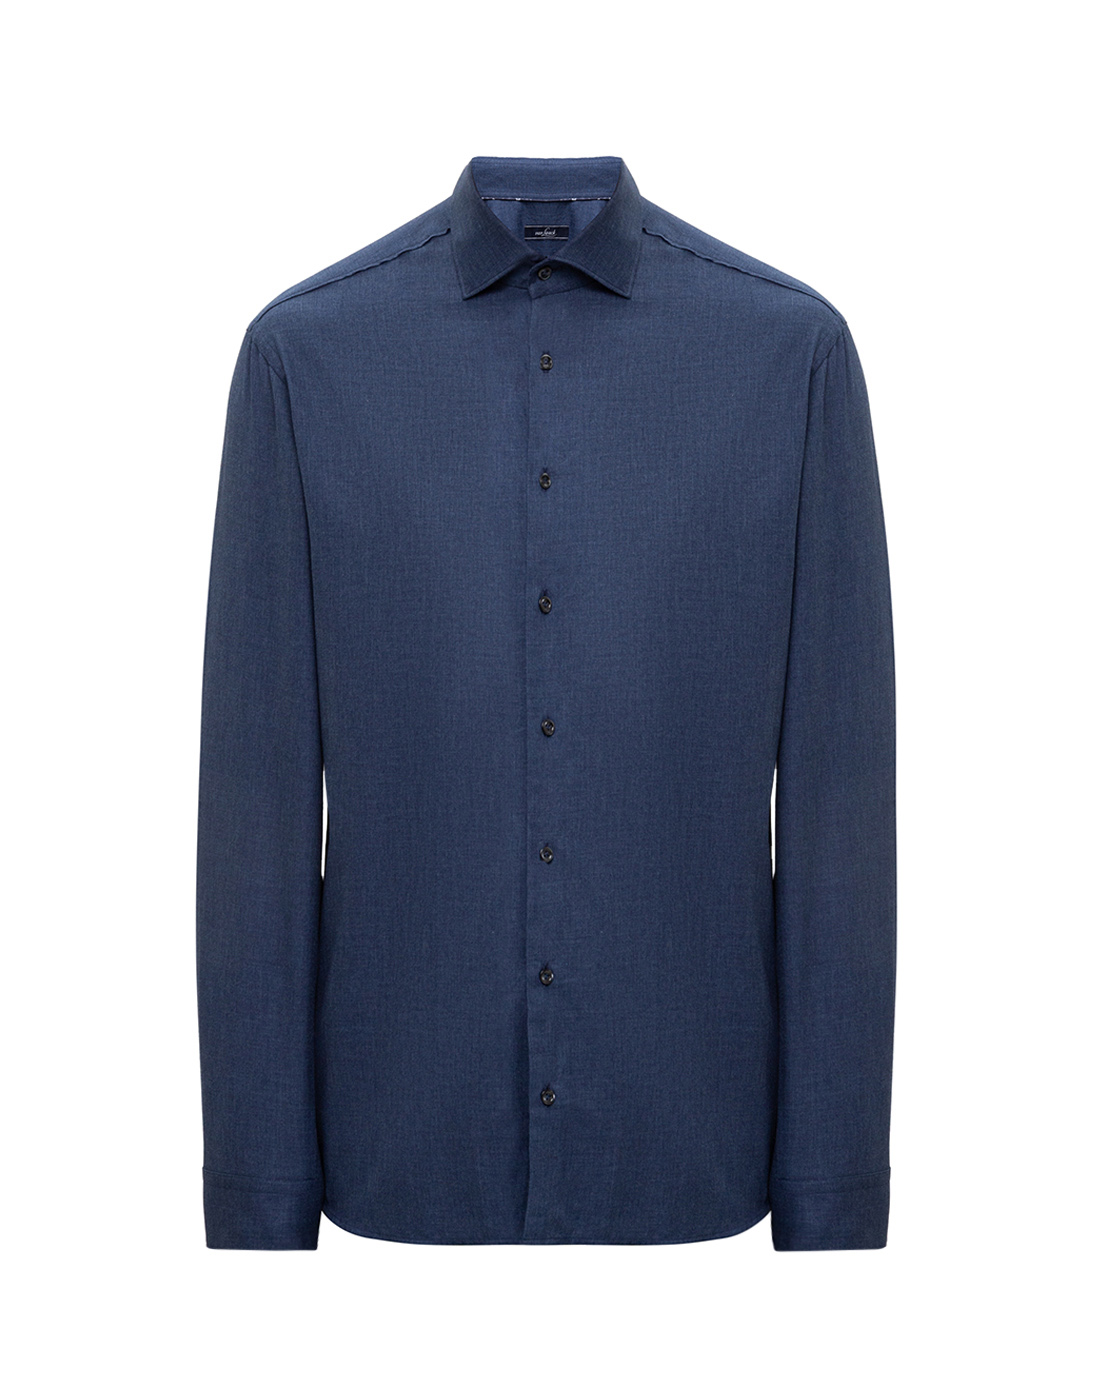 Мужская темно-синяя рубашка Van Laack S155026/780-1